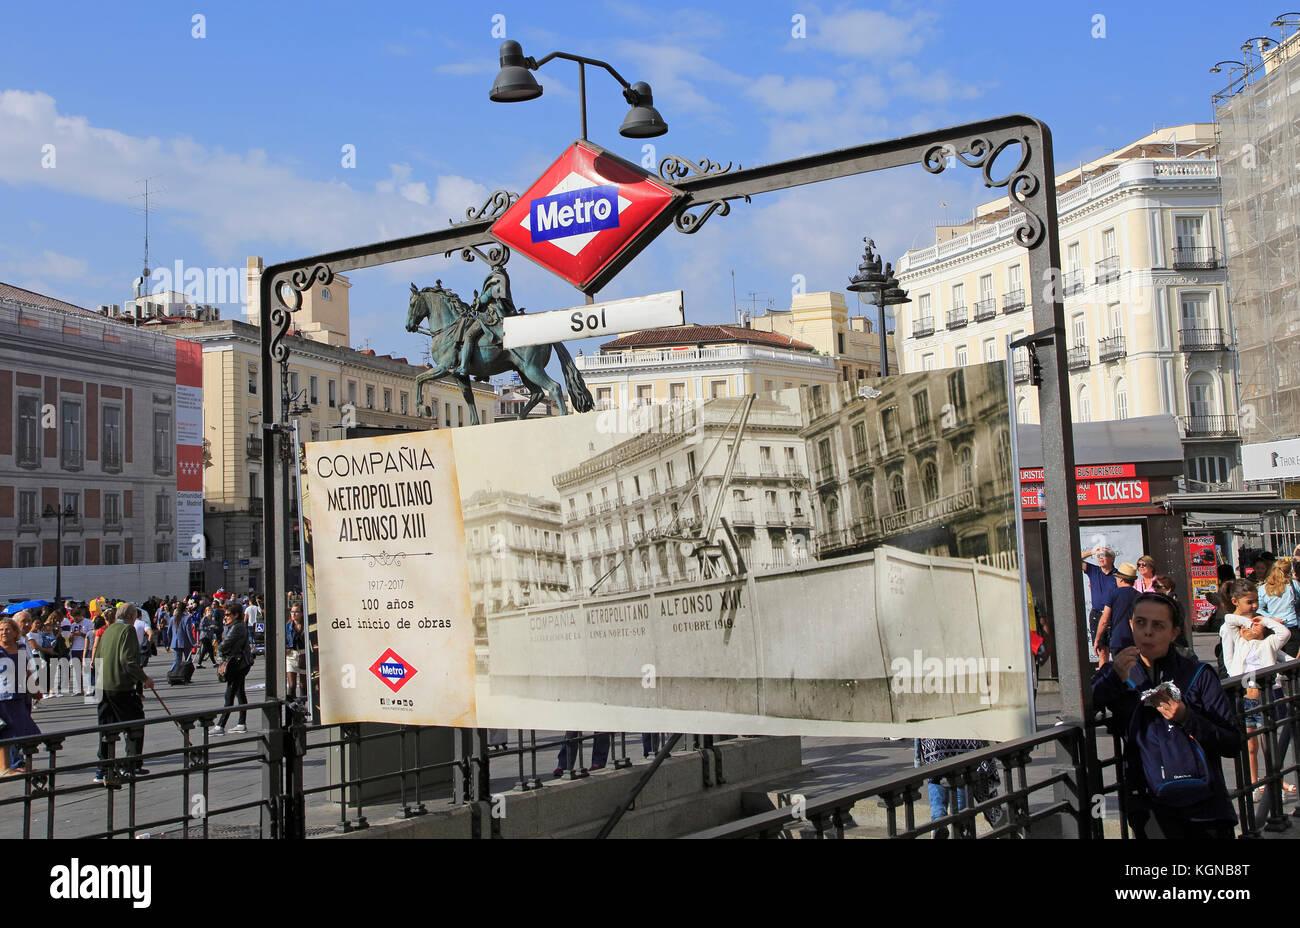 Spanish metro madrid stock photos spanish metro madrid for Plaza de la puerta del sol